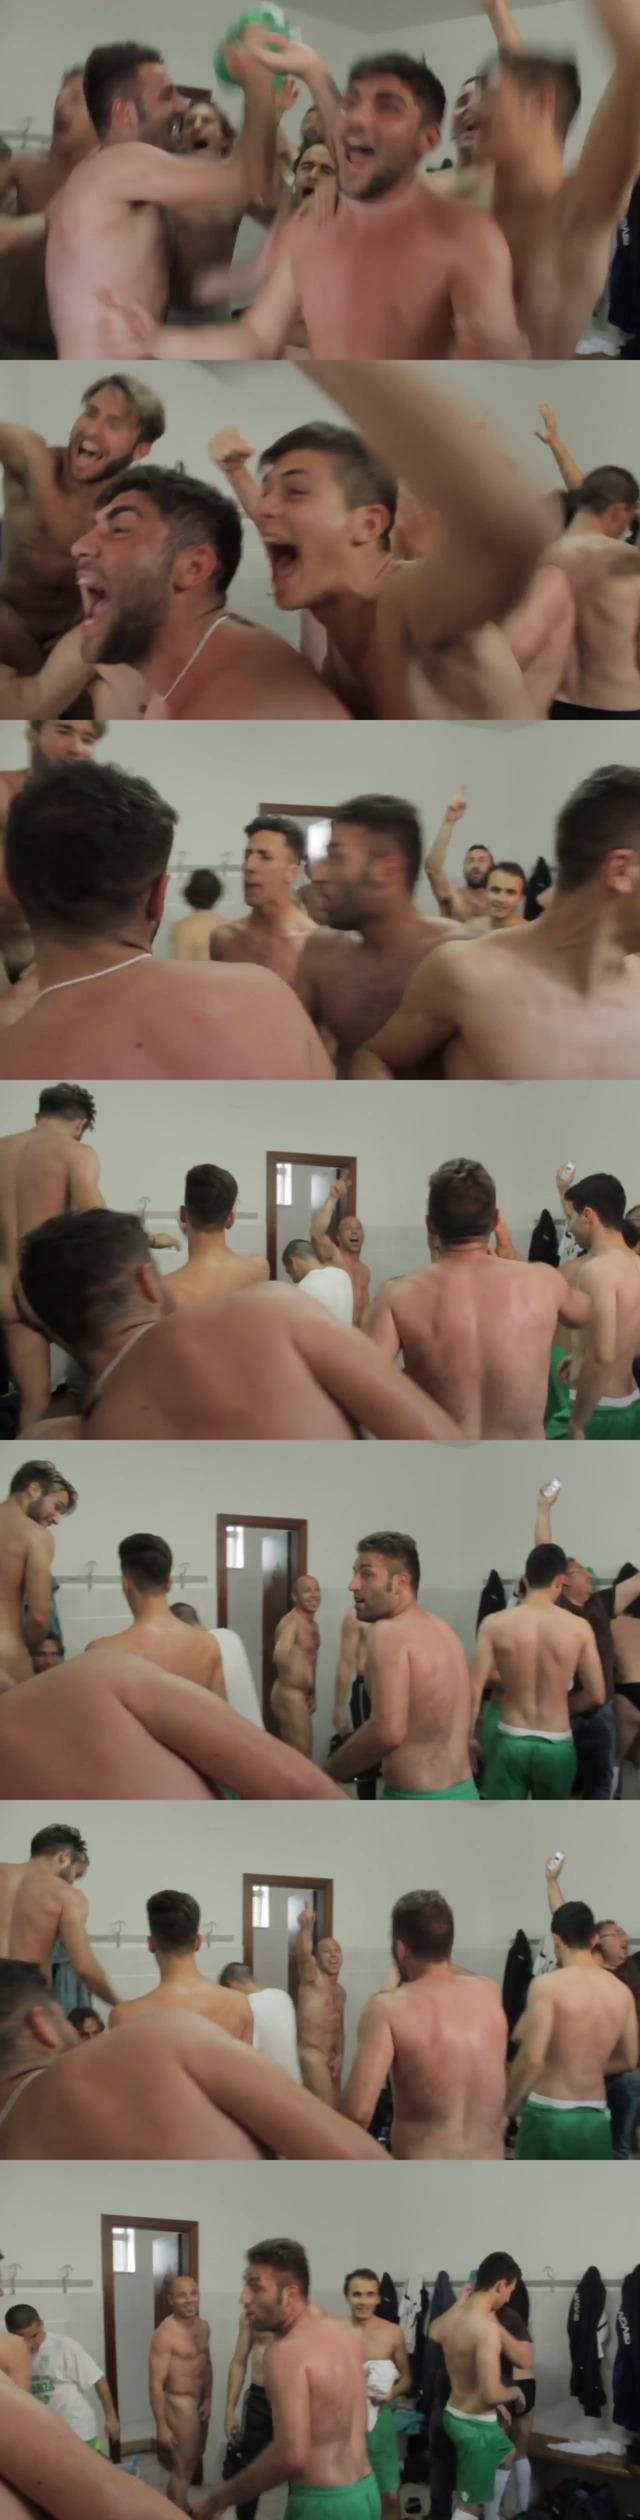 football club naked celebration locker room